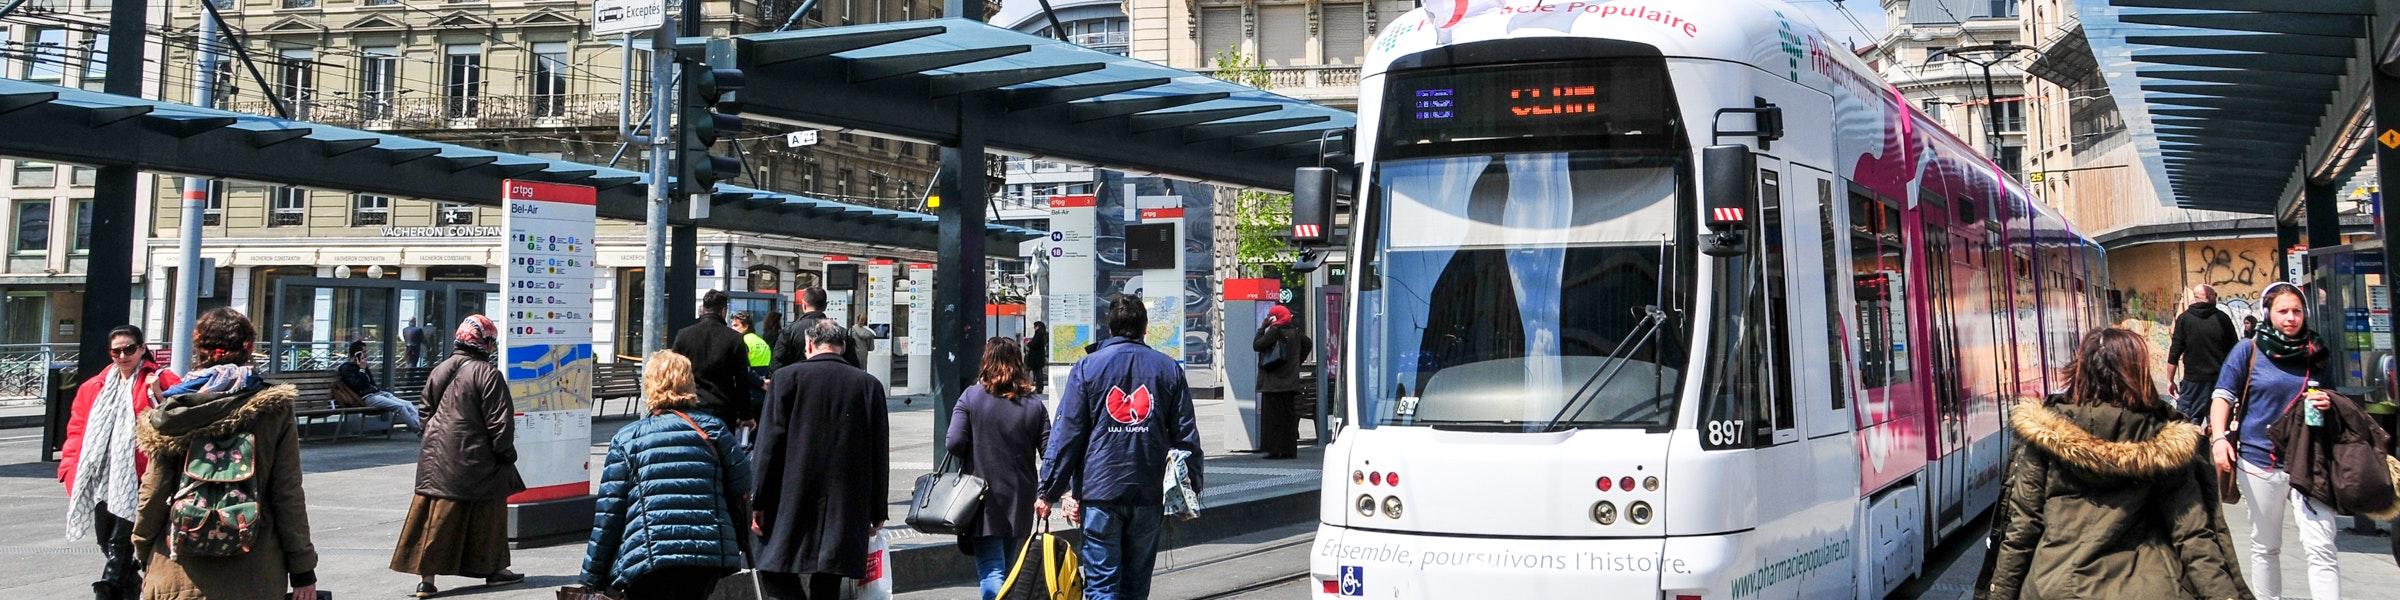 Place de Bel Air Genève tramhalte